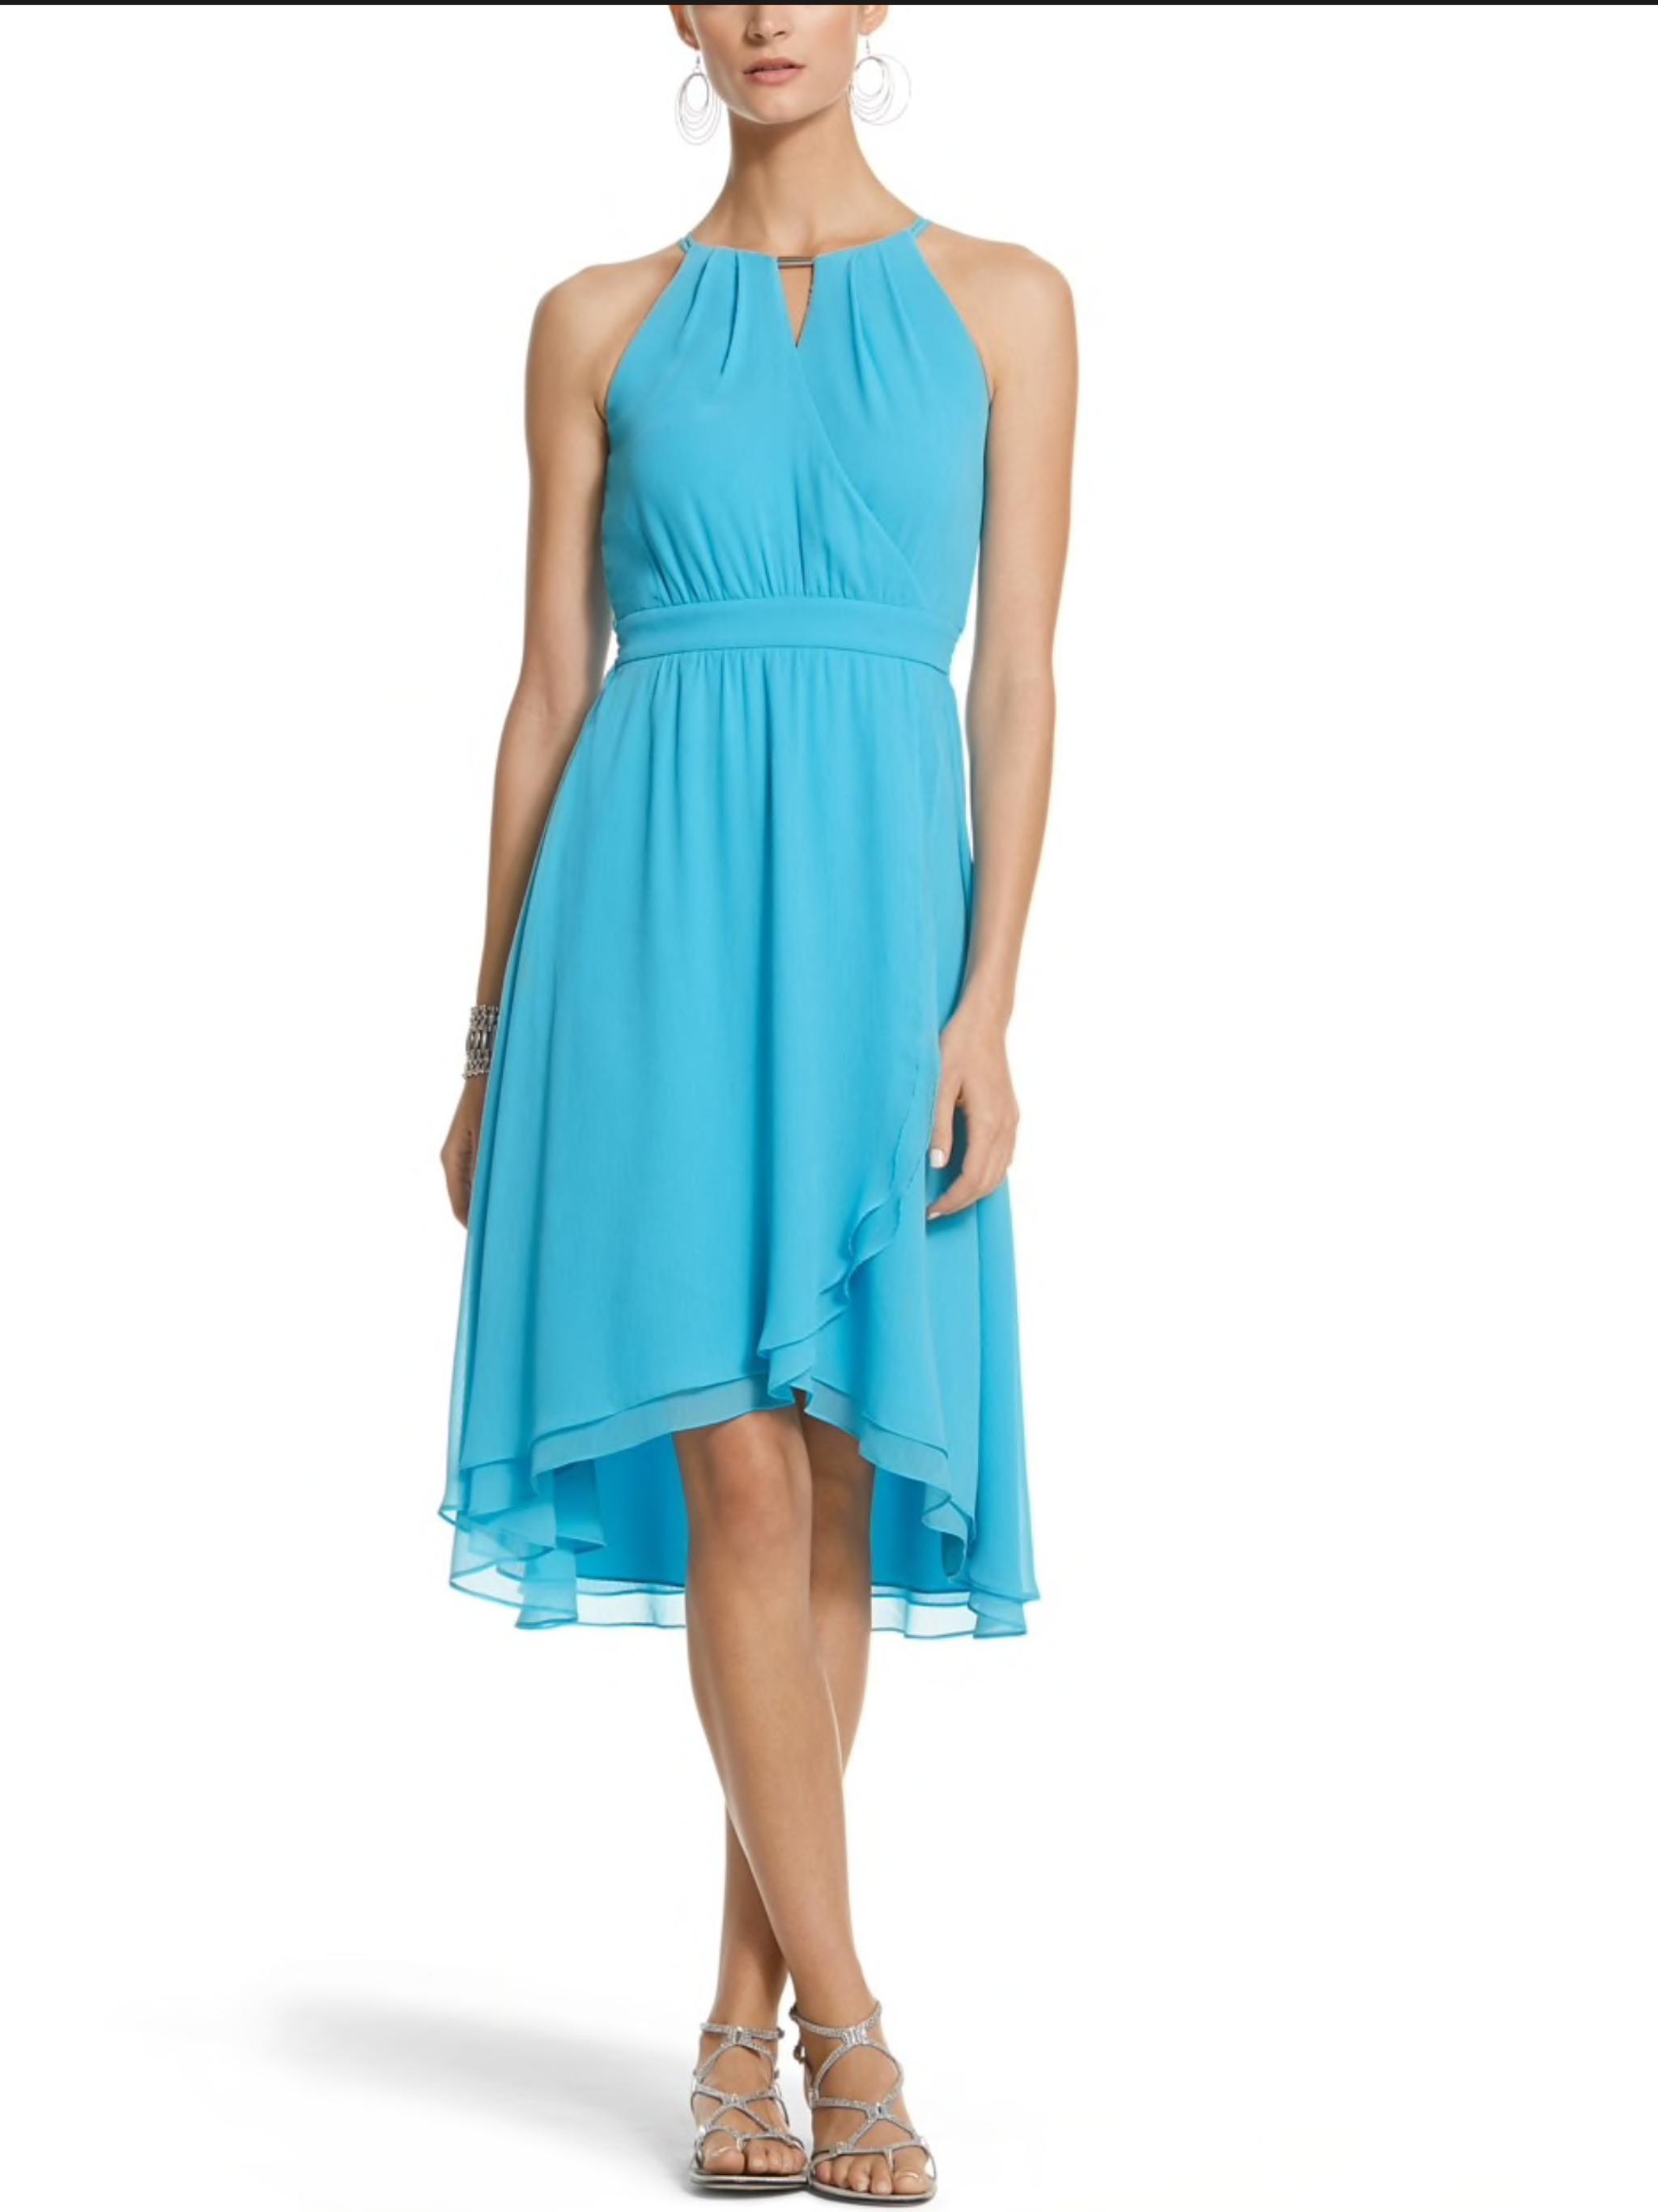 White House Black Market size 4 chiffon fit & flare high-low dress ...